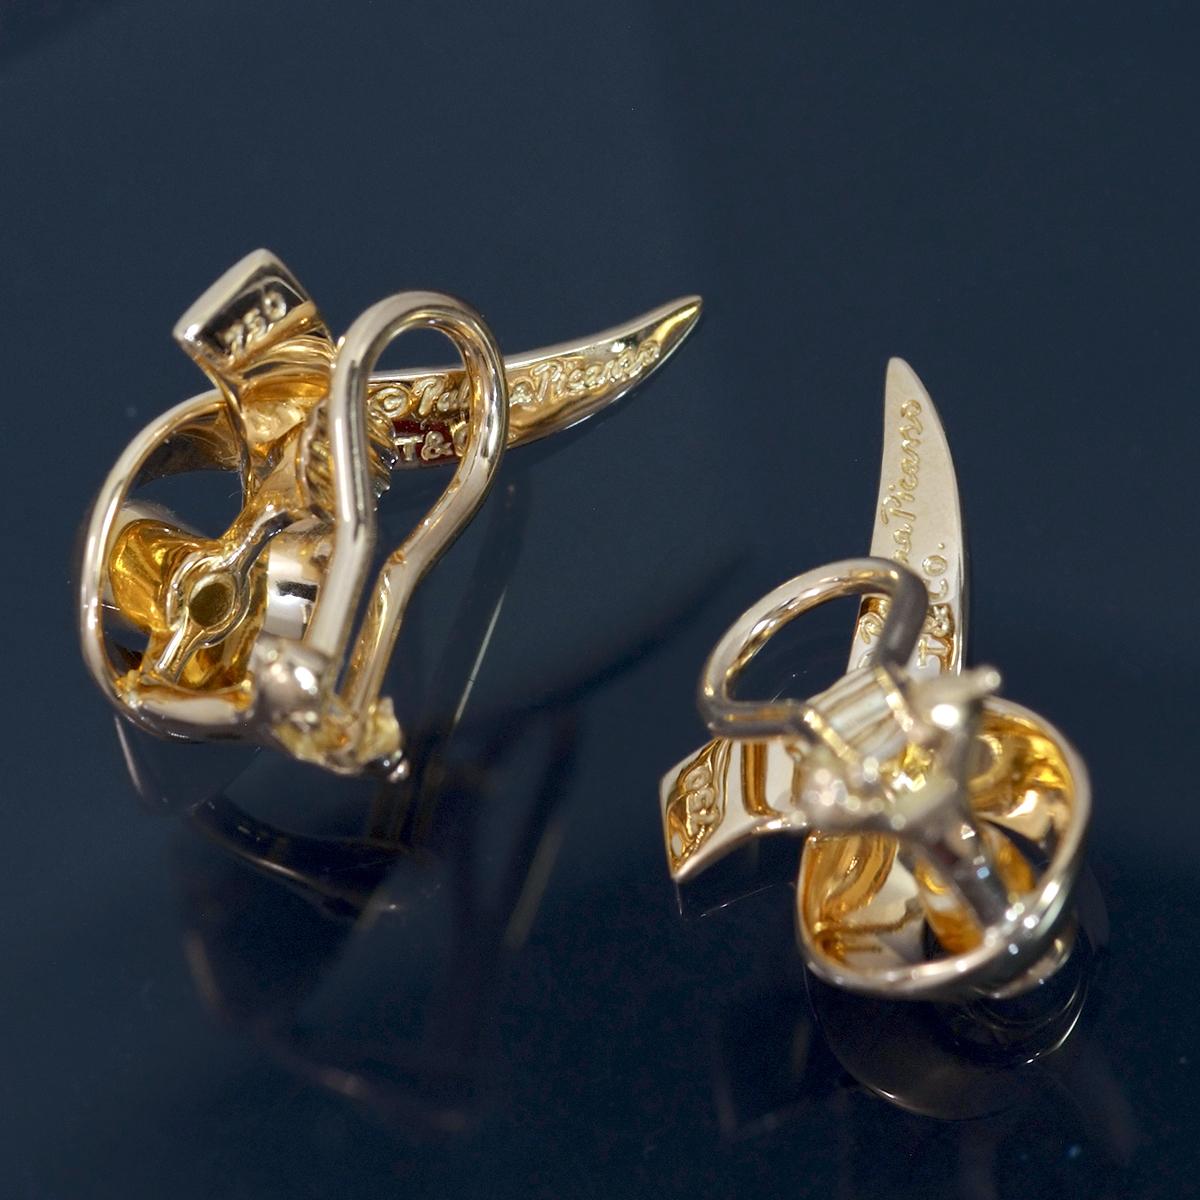 E9962【Tiffany&Co. 1837】ティファニー パロマピカソ 天然絶品ダイヤモンド2pcs 最高級18金無垢イヤリング 重量7.9g 幅13.6×23.3mm_画像3